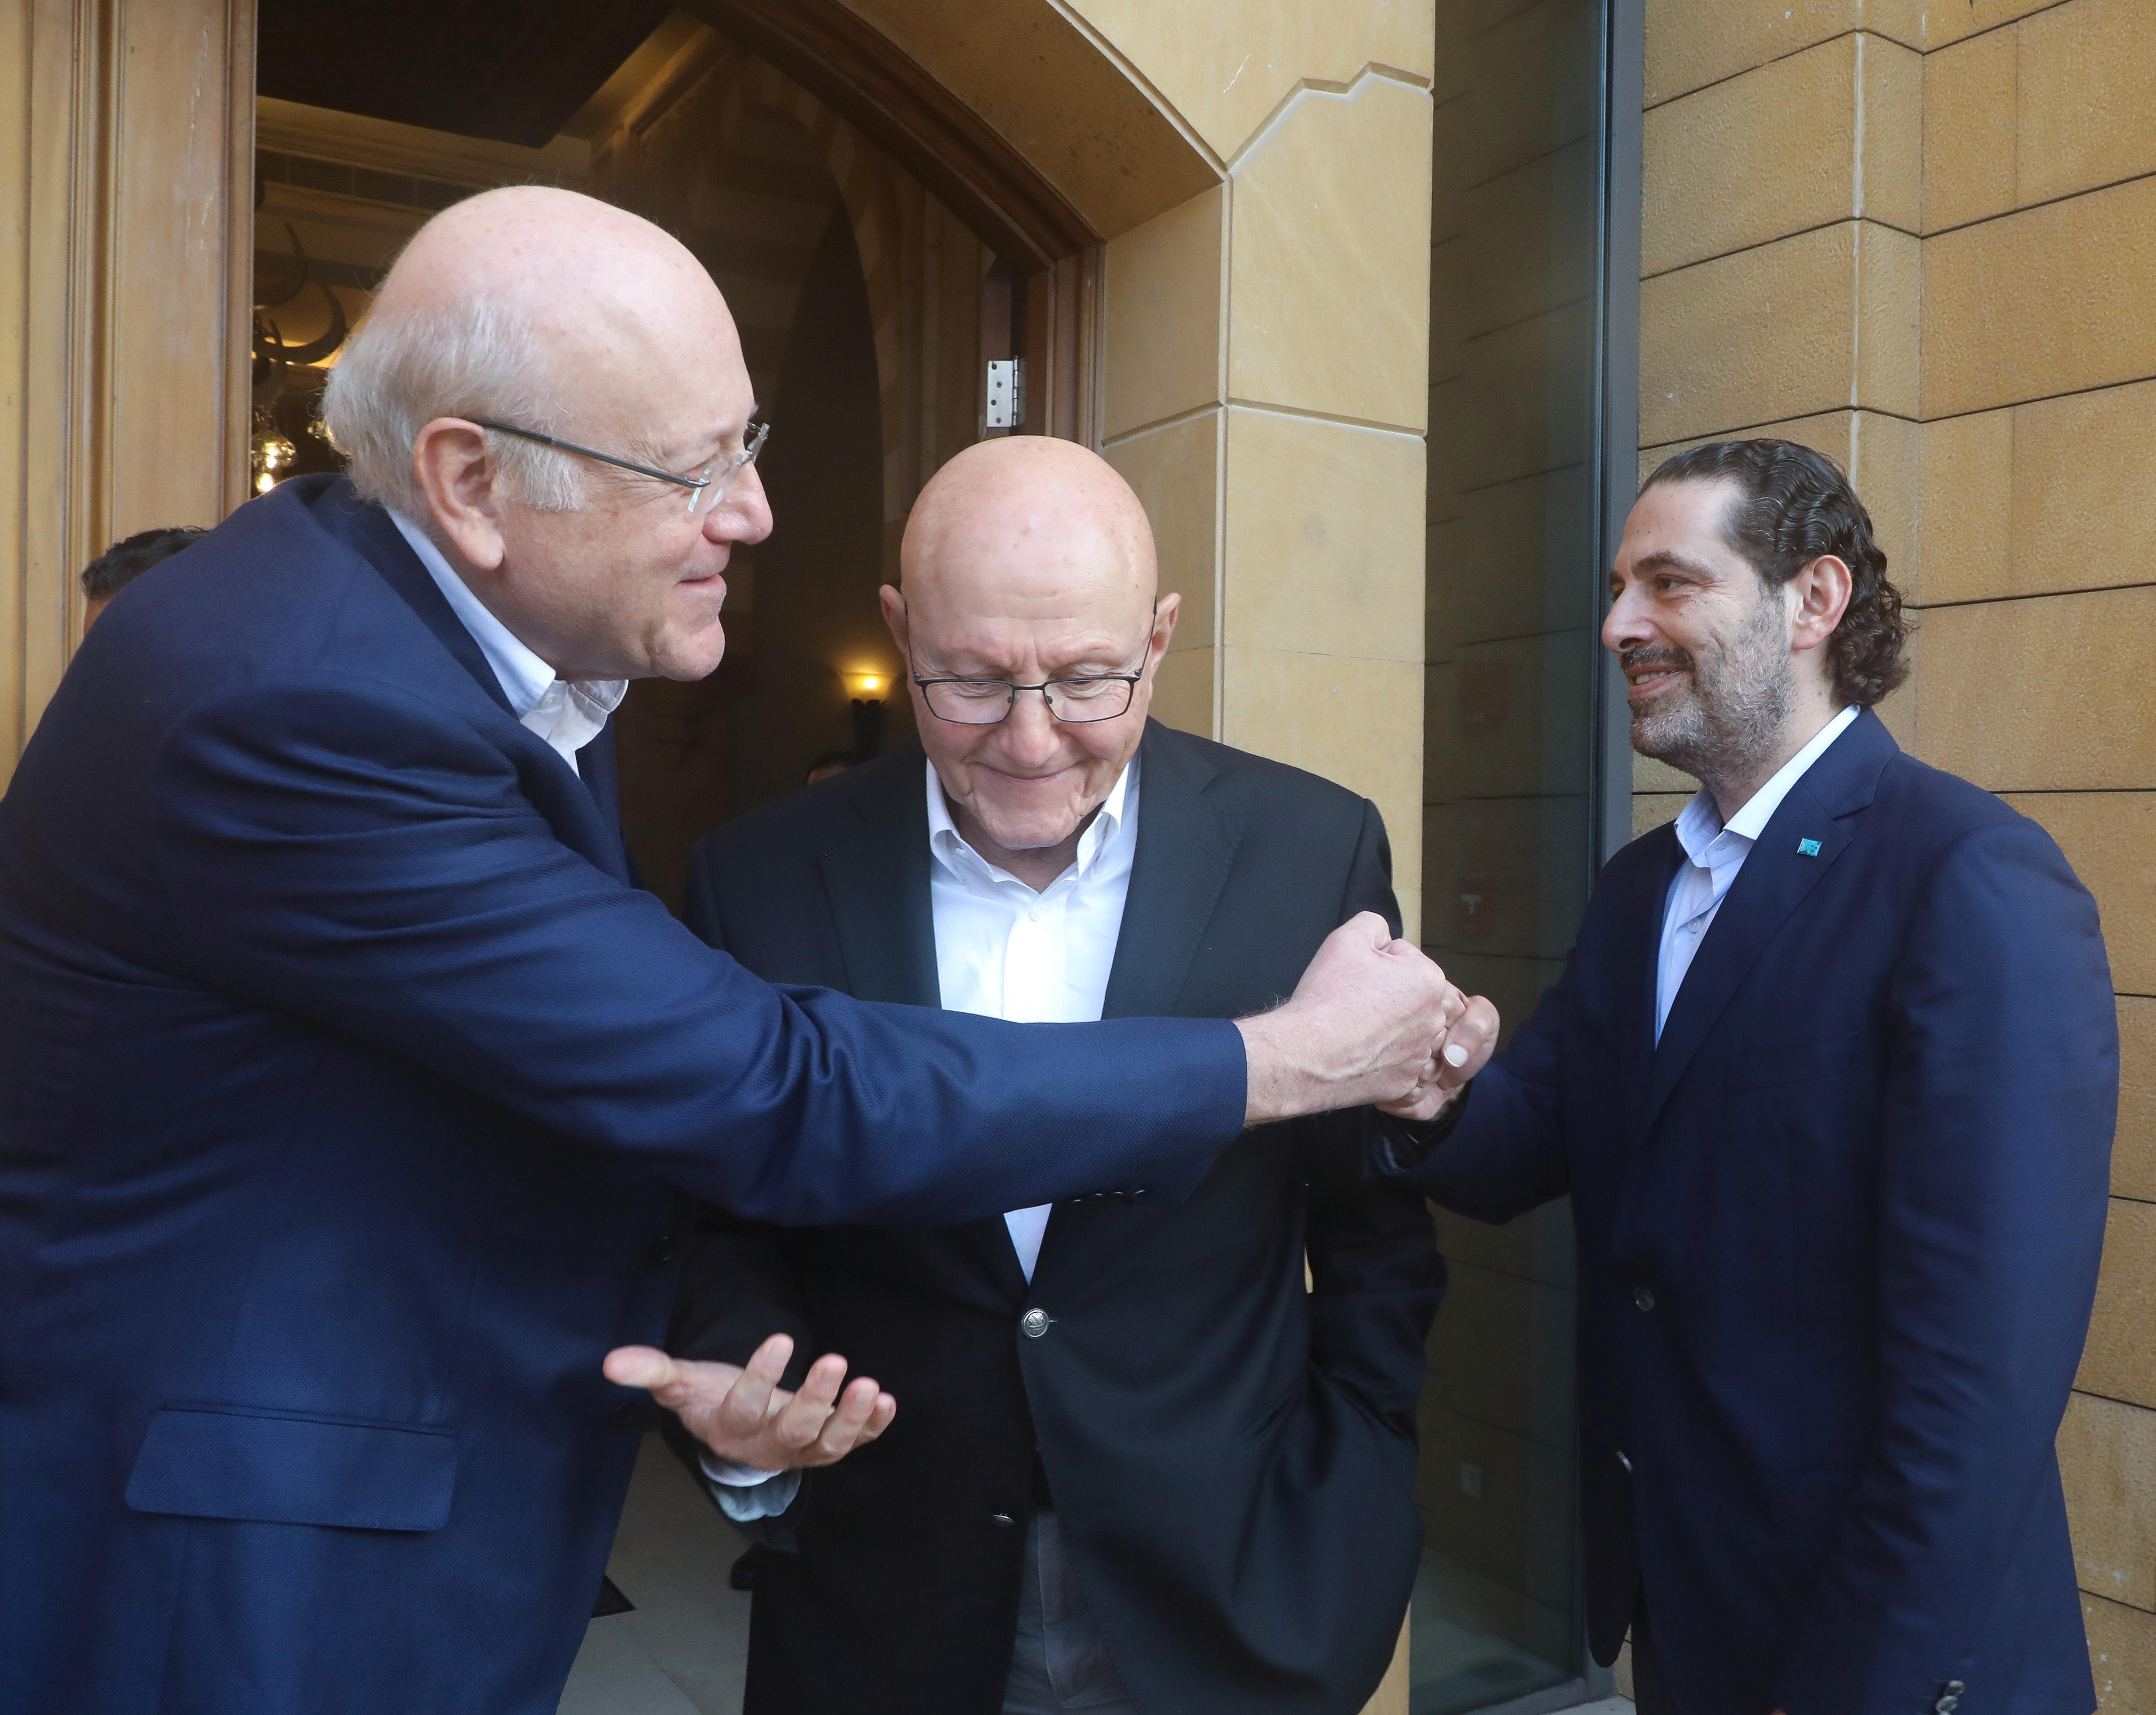 Lebanese former prime ministers, Saad al-Hariri and Najib Mikati greet each other in Beirut, Lebanon July 25, 2021. Dalati Nohra/Handout via REUTERS